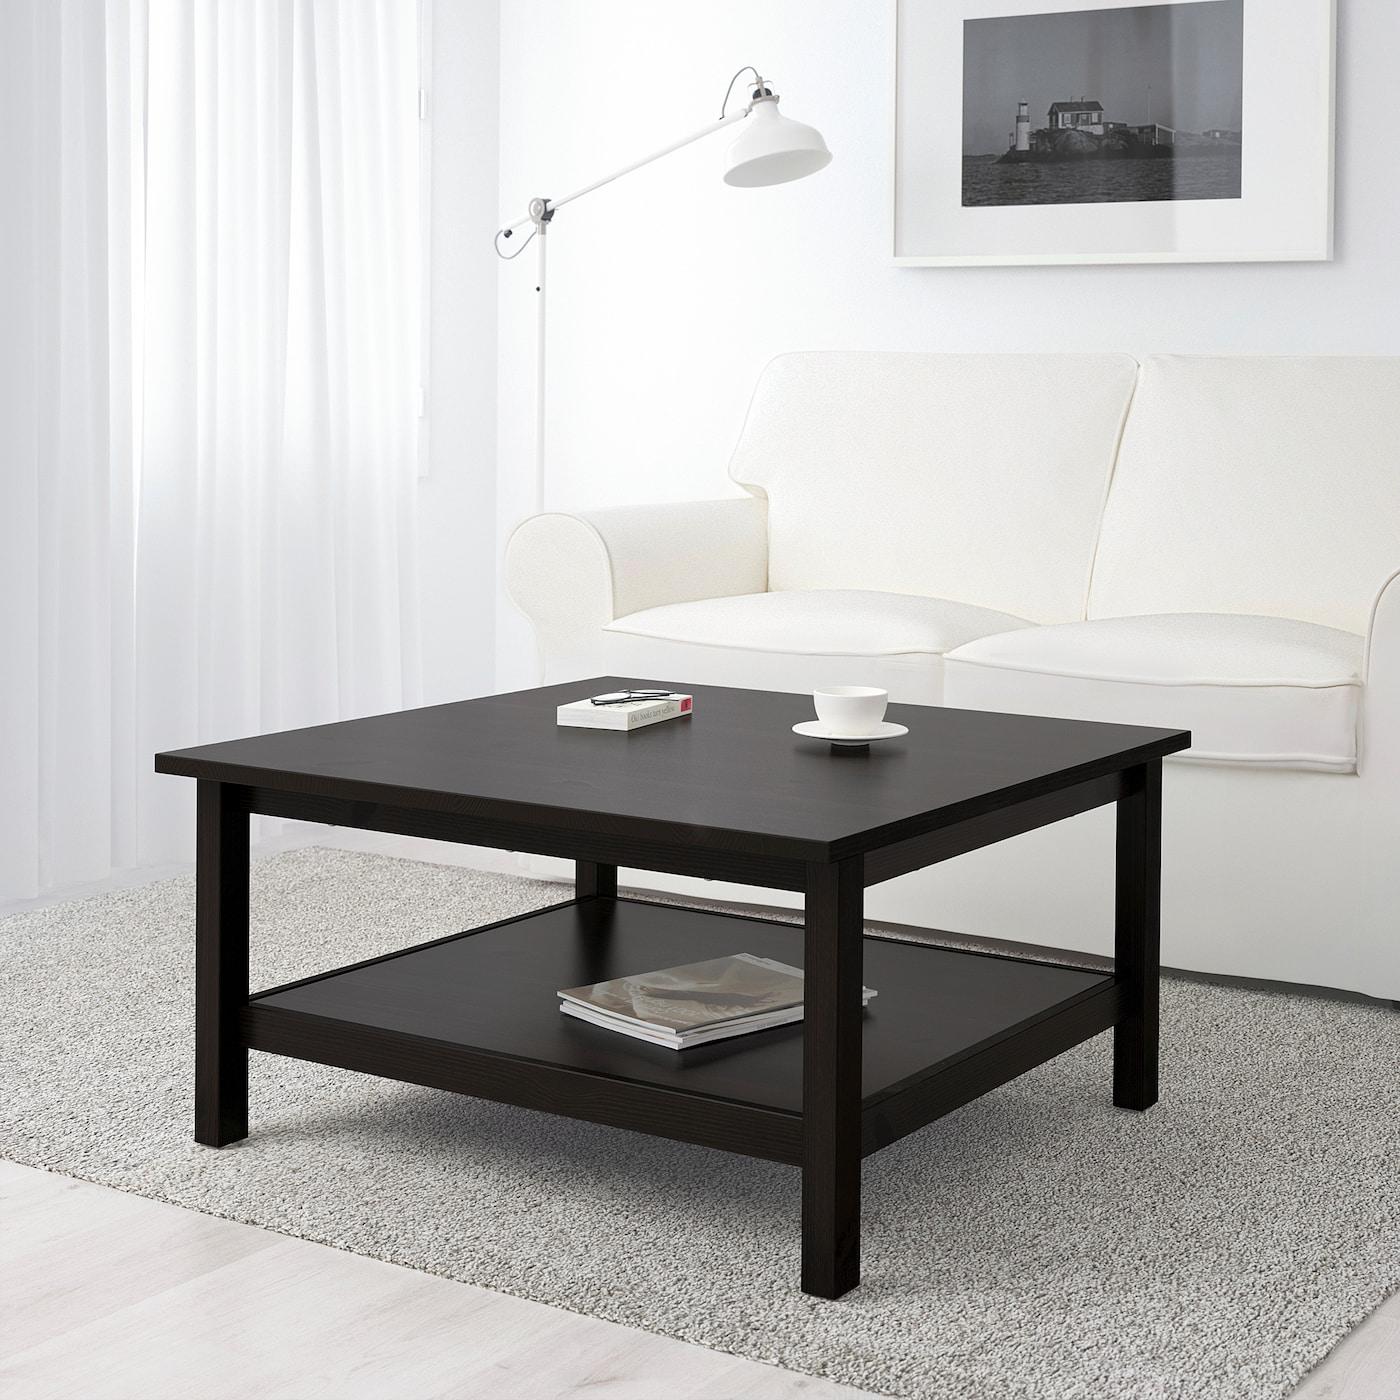 Hemnes Coffee Table Black Brown 35 3 8x35 3 8 Ikea